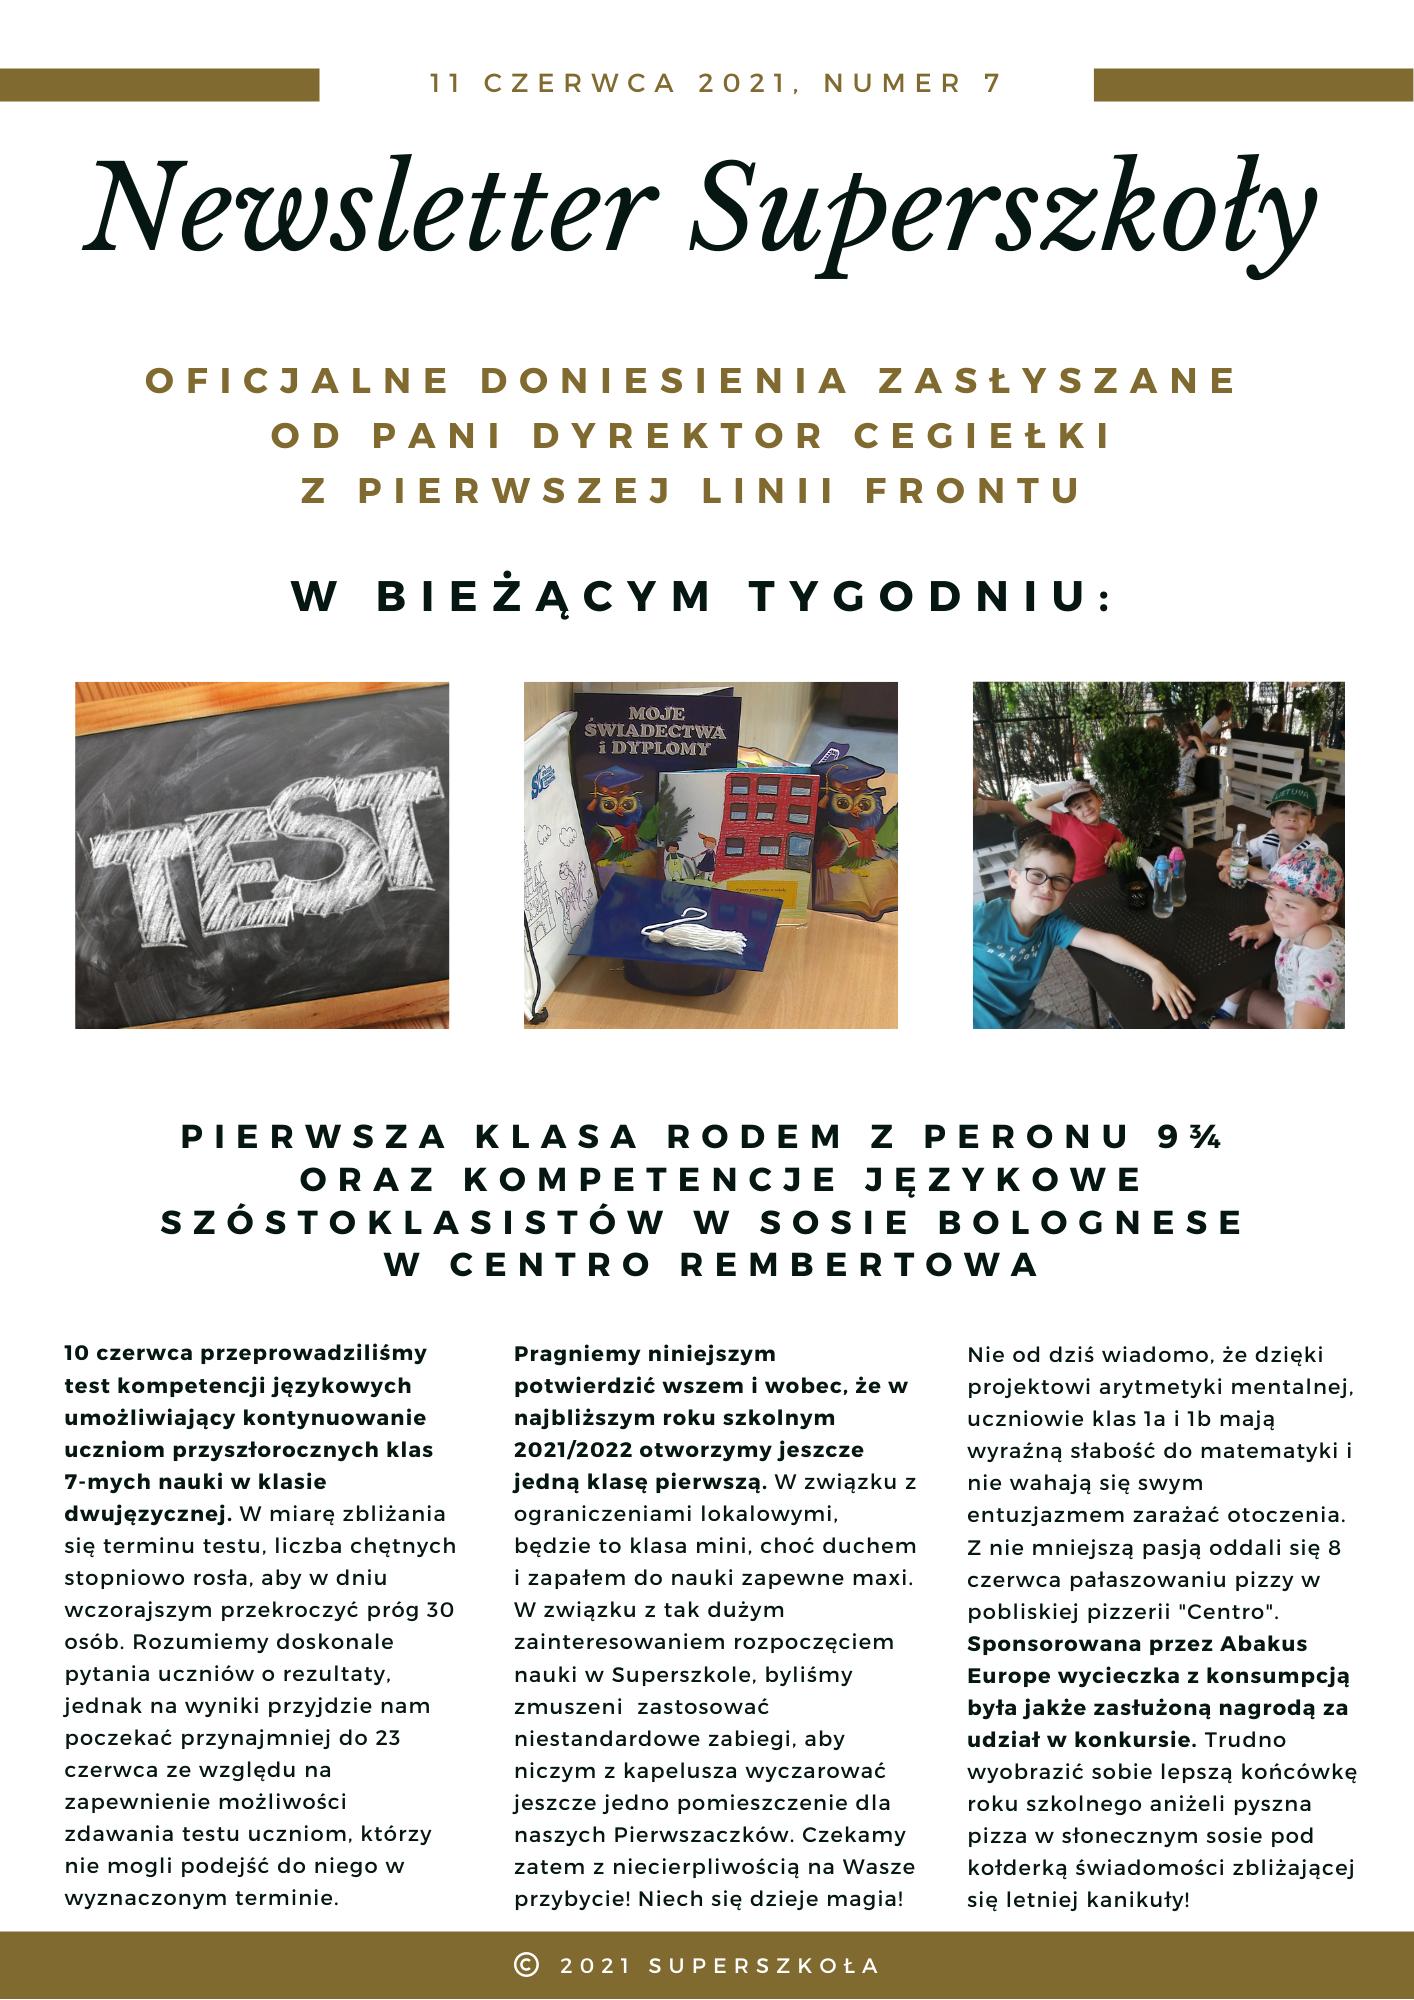 Newsletter_Superszkoły_7